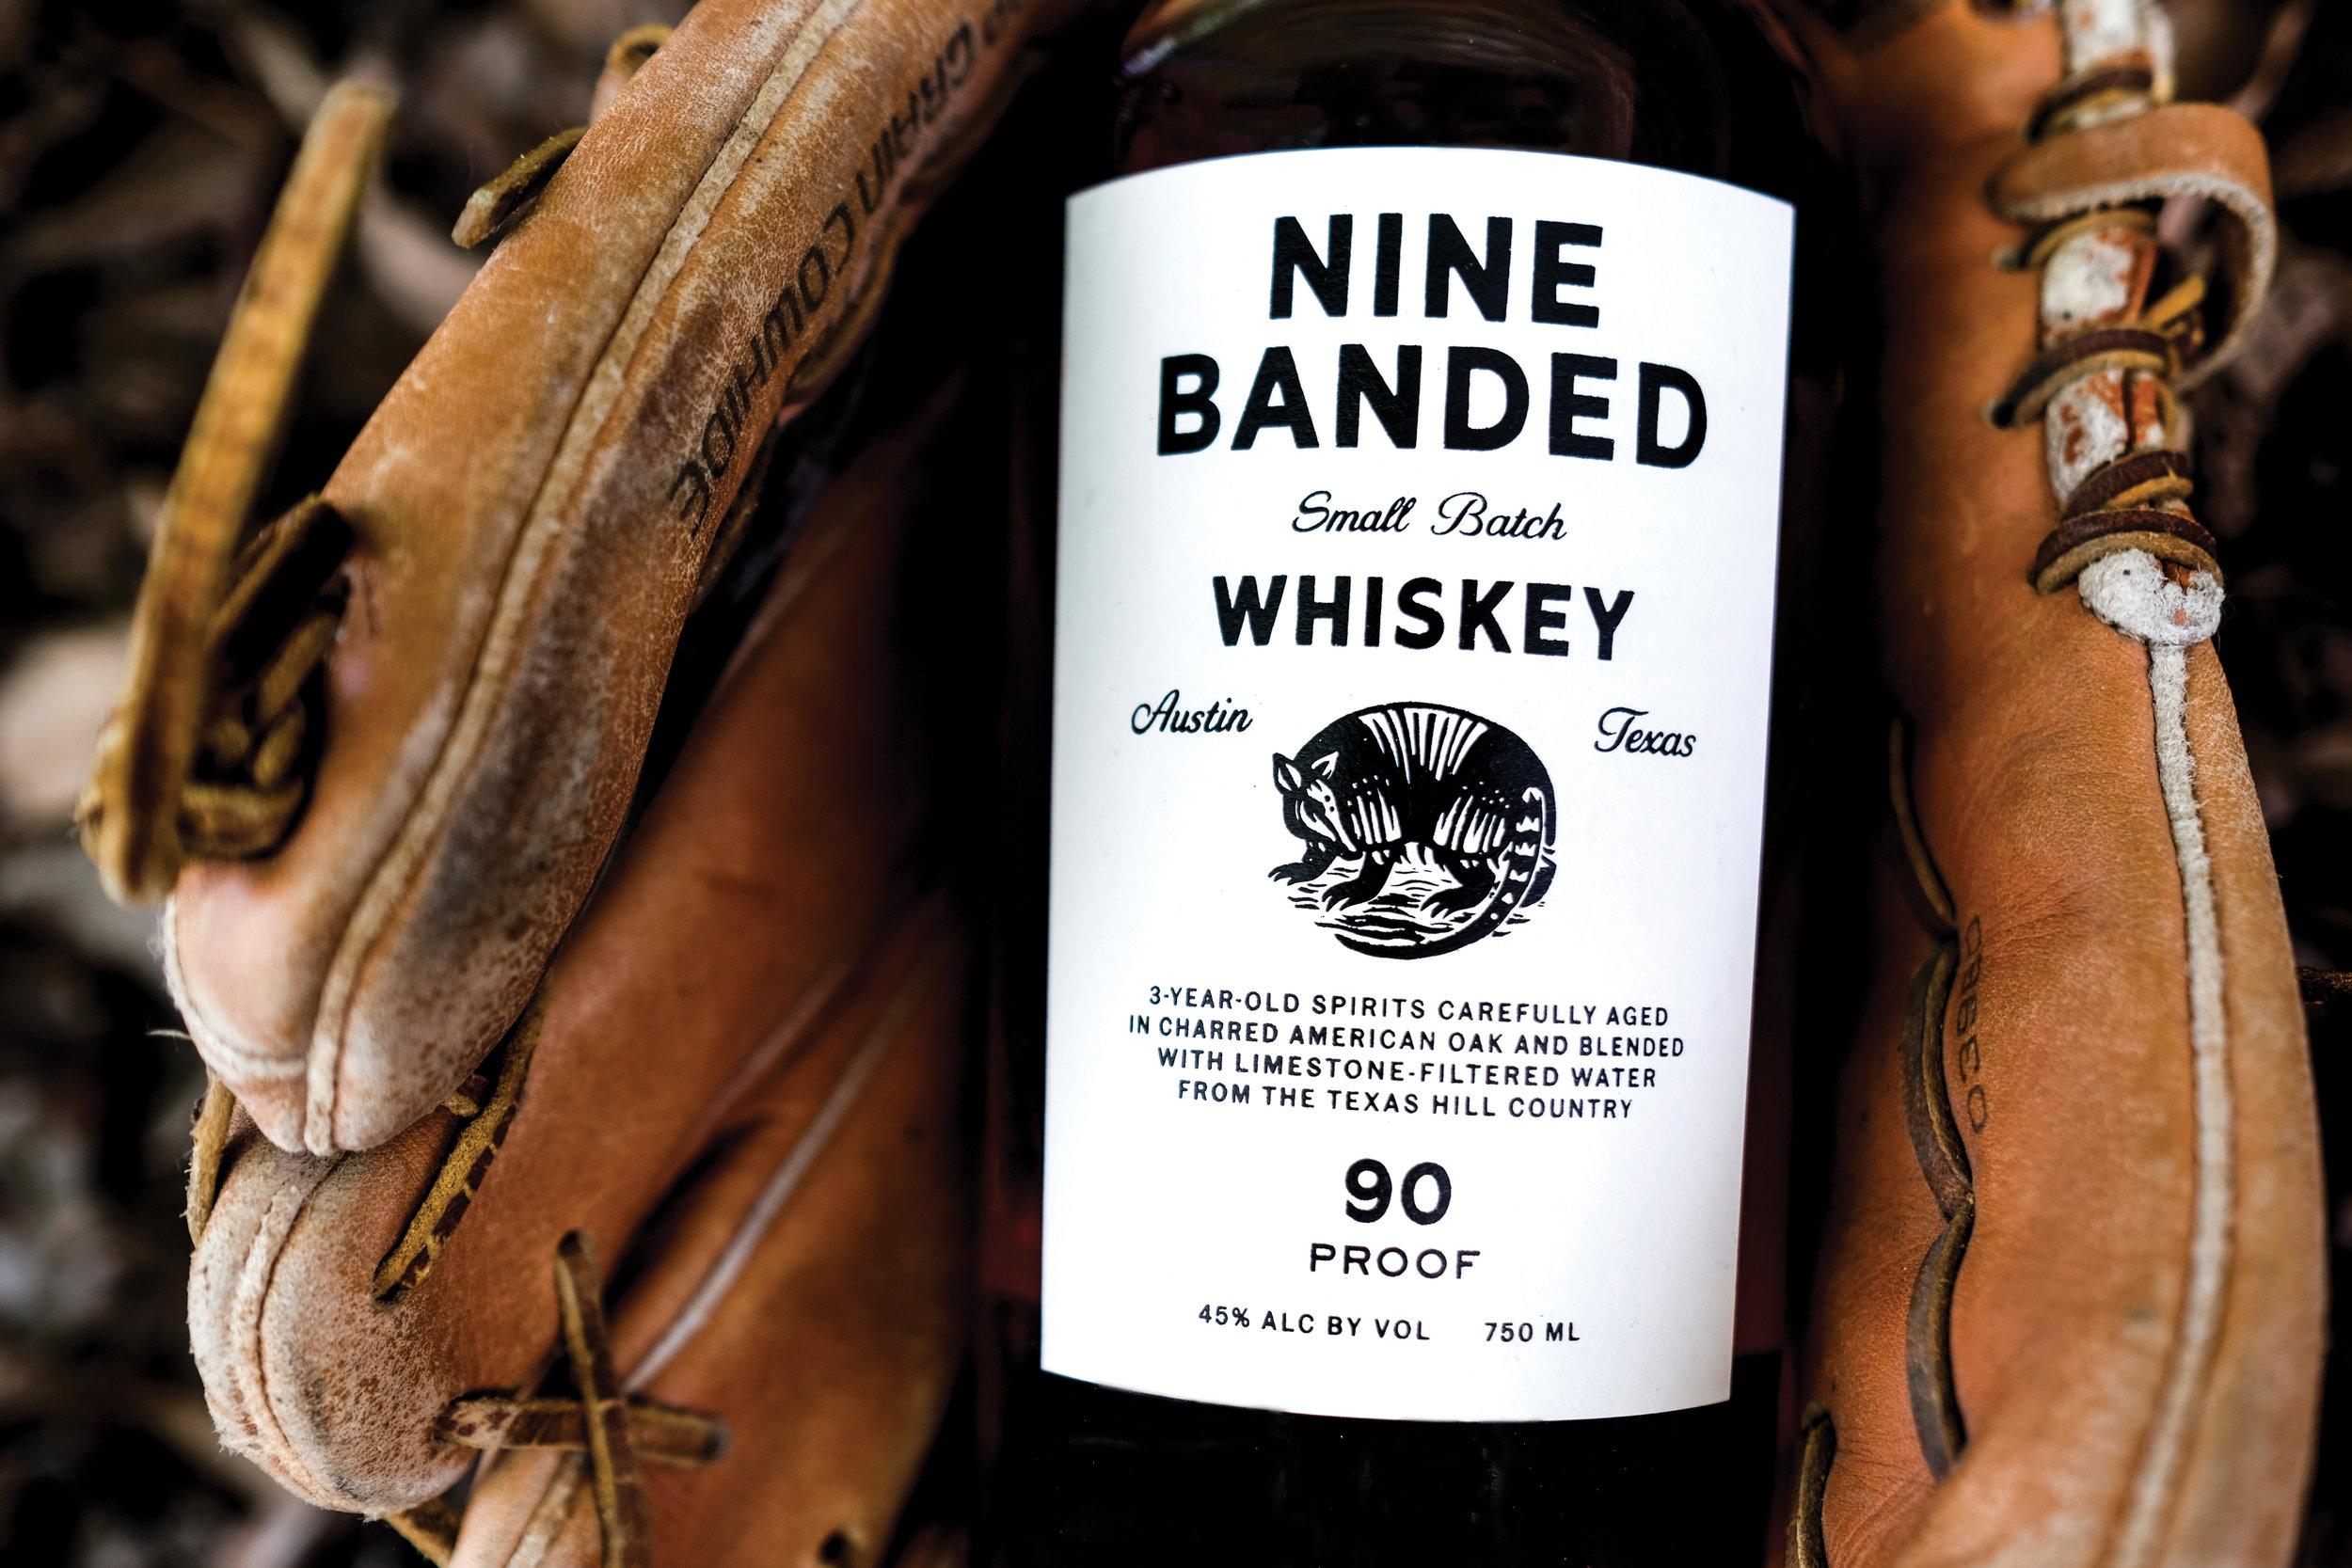 Nine_Banded_Whiskey_Round_Rock_Express_mledits.jpg